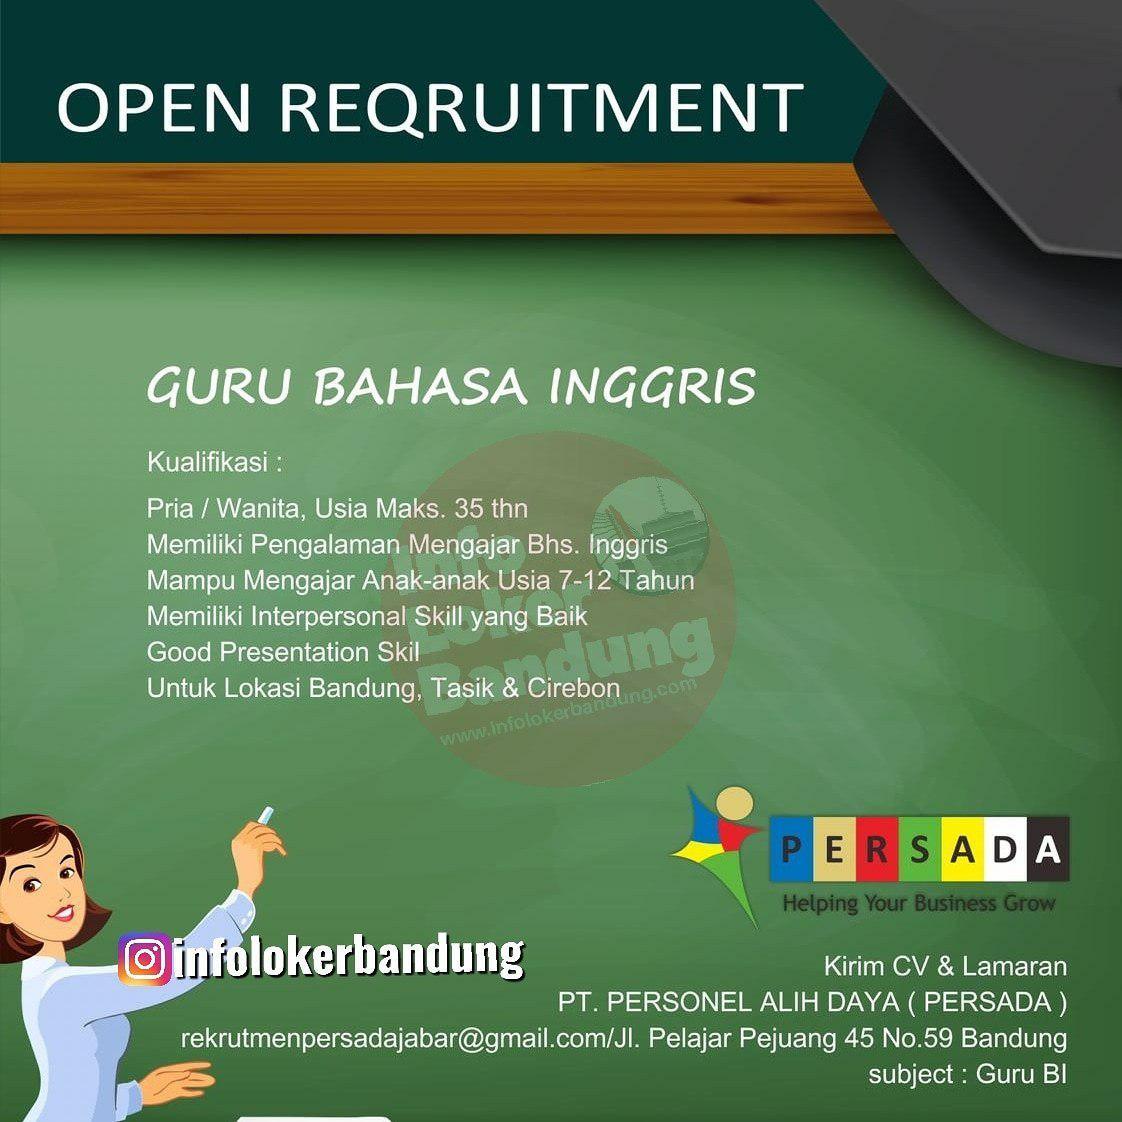 Lowongan Kerja Guru Bahasa Inggris Persada Bandung Oktober 2019